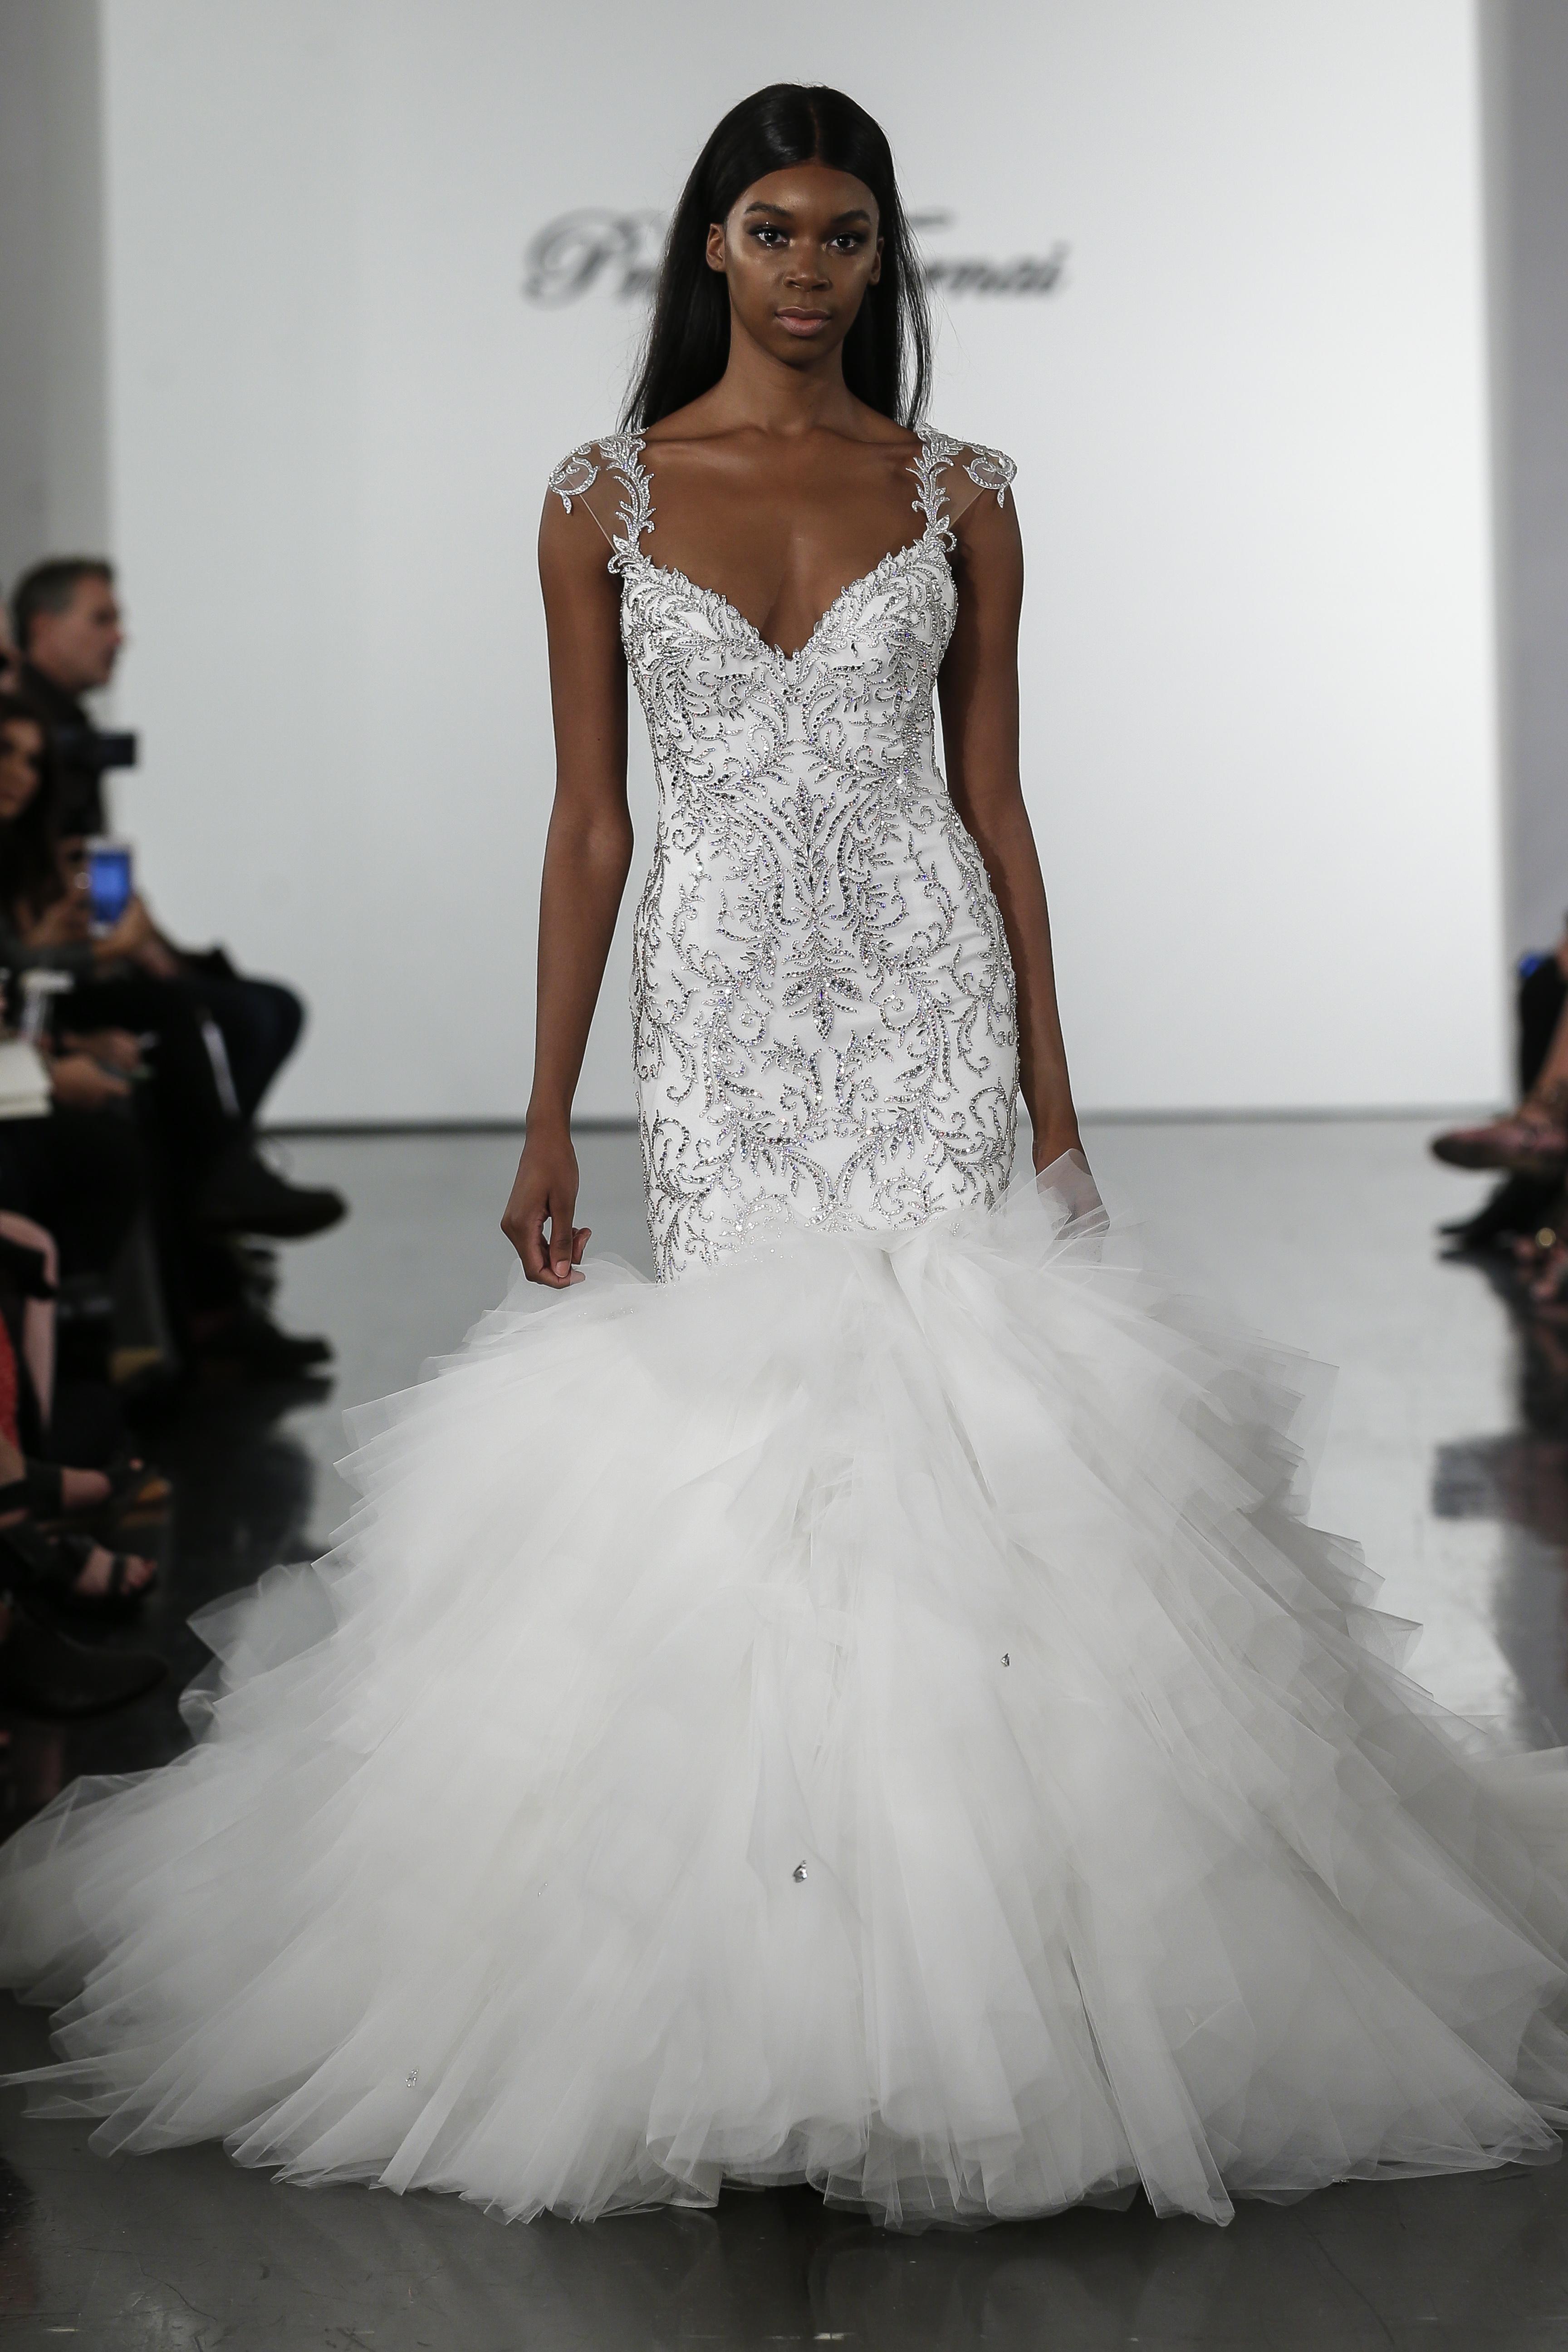 797defde26e Crystall Embellished Mermaid Wedding Dress With Tulle Skirt ...